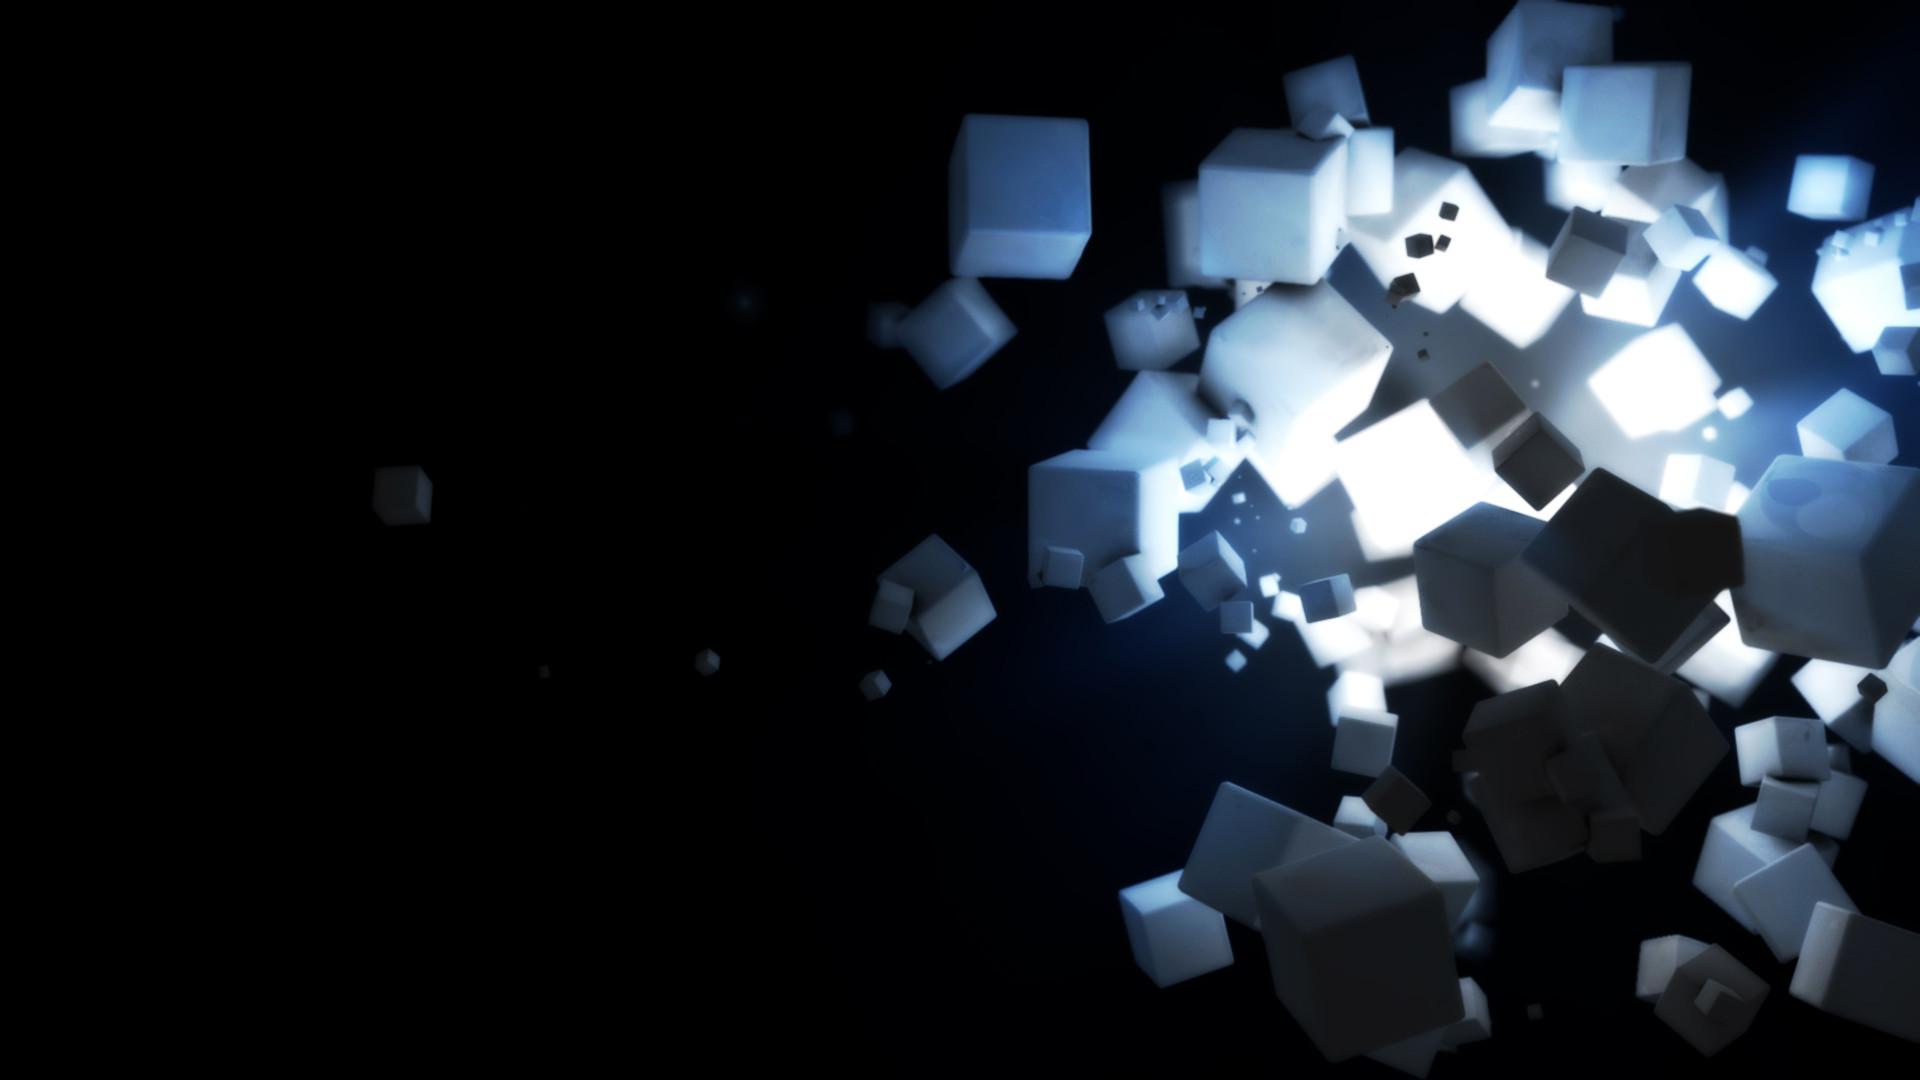 Dark Cubes Wallpapers   HD Wallpapers